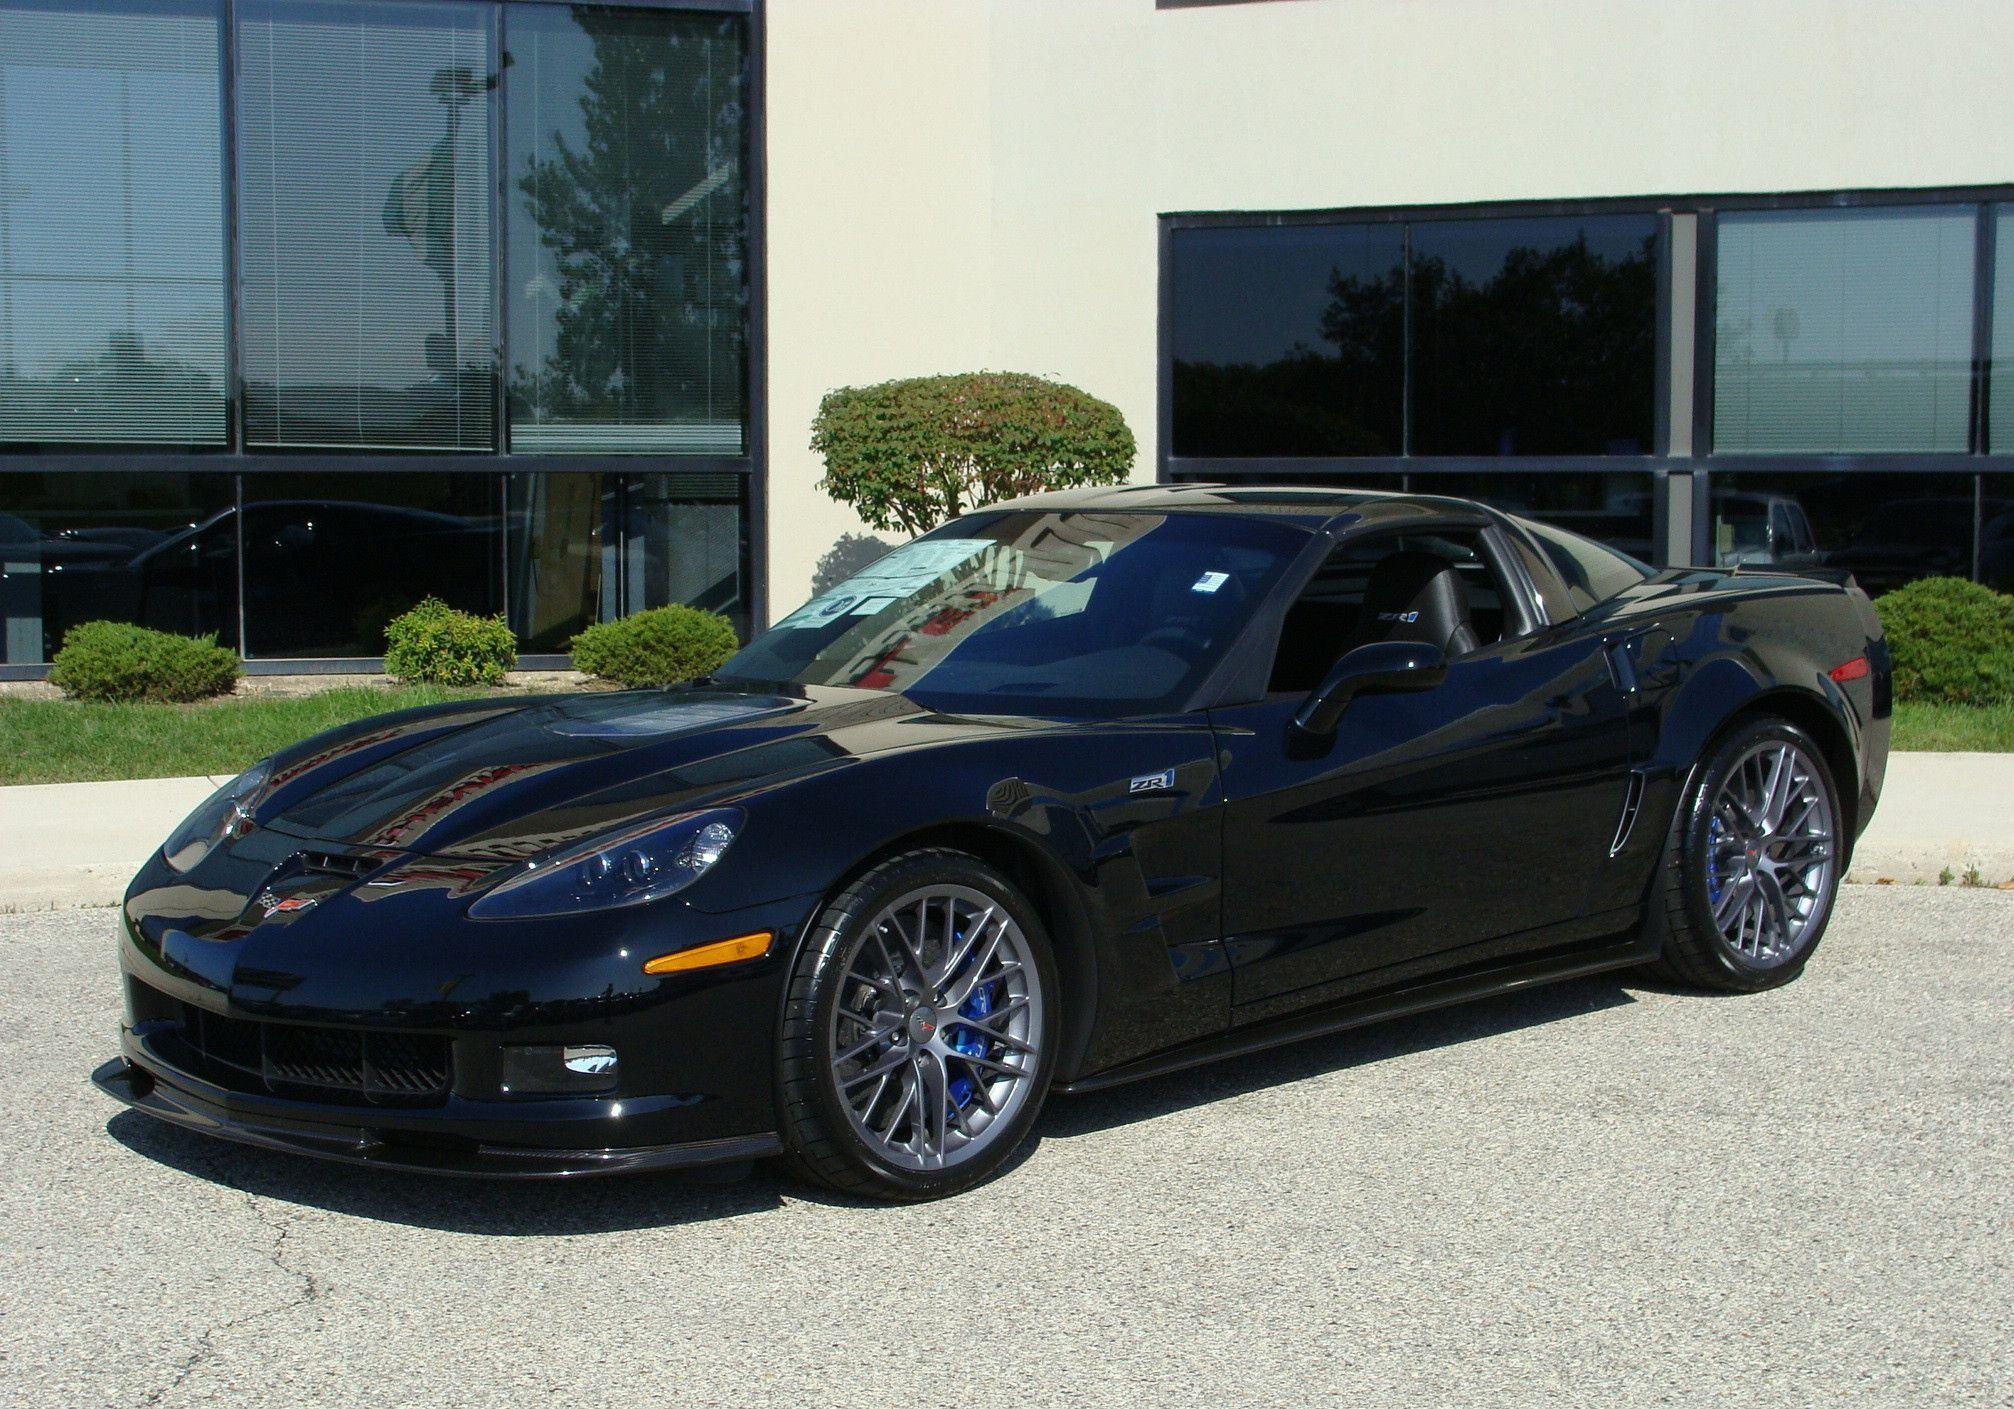 black corvette zr1 wallpapers - photo #12